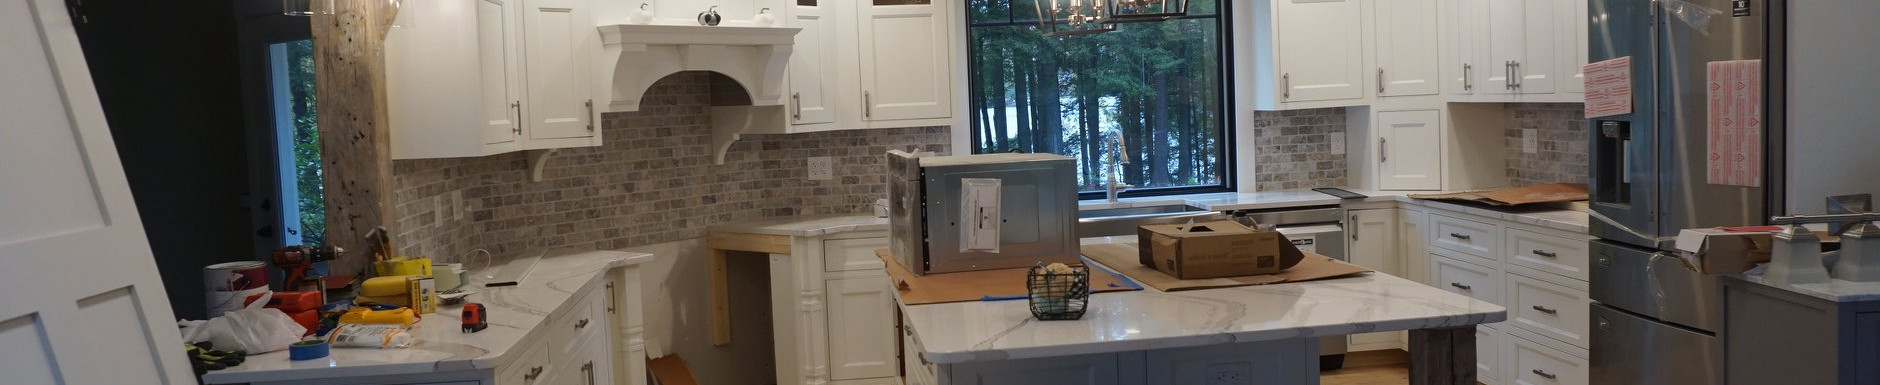 Kitchen mount vernon near done lighting